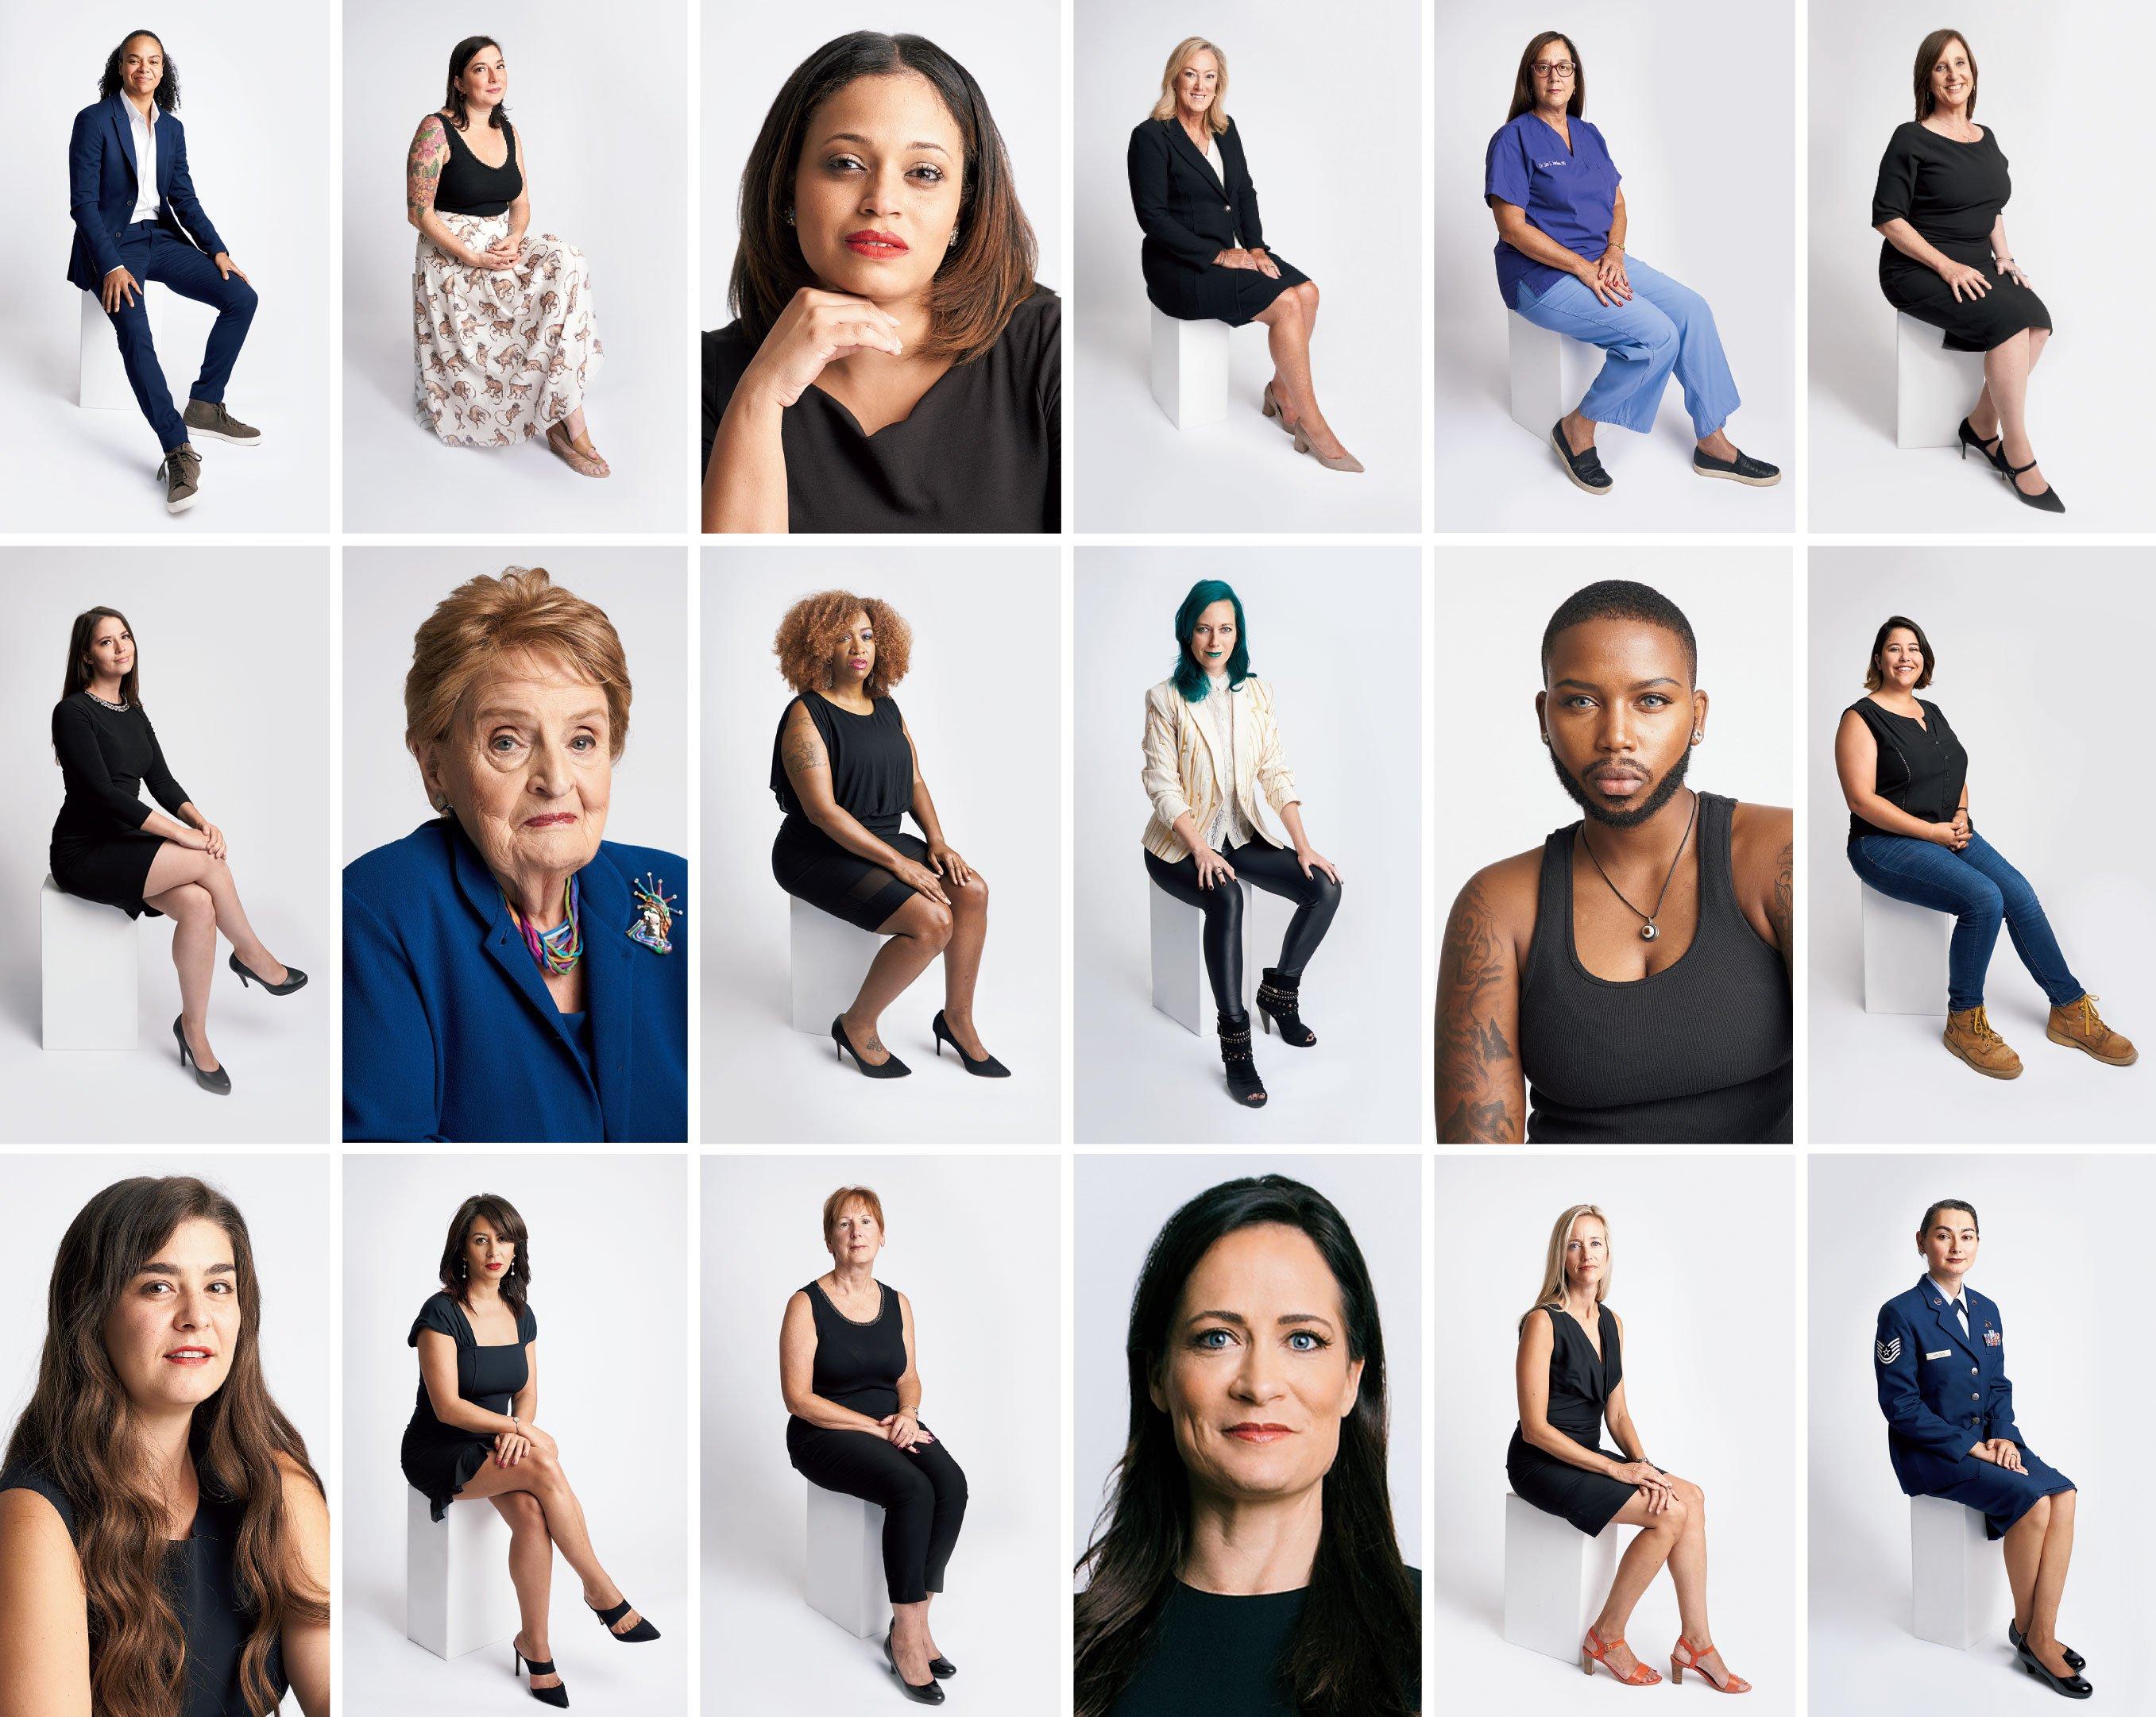 What It's Like to Be a Woman in Washington: 62 Women Explain